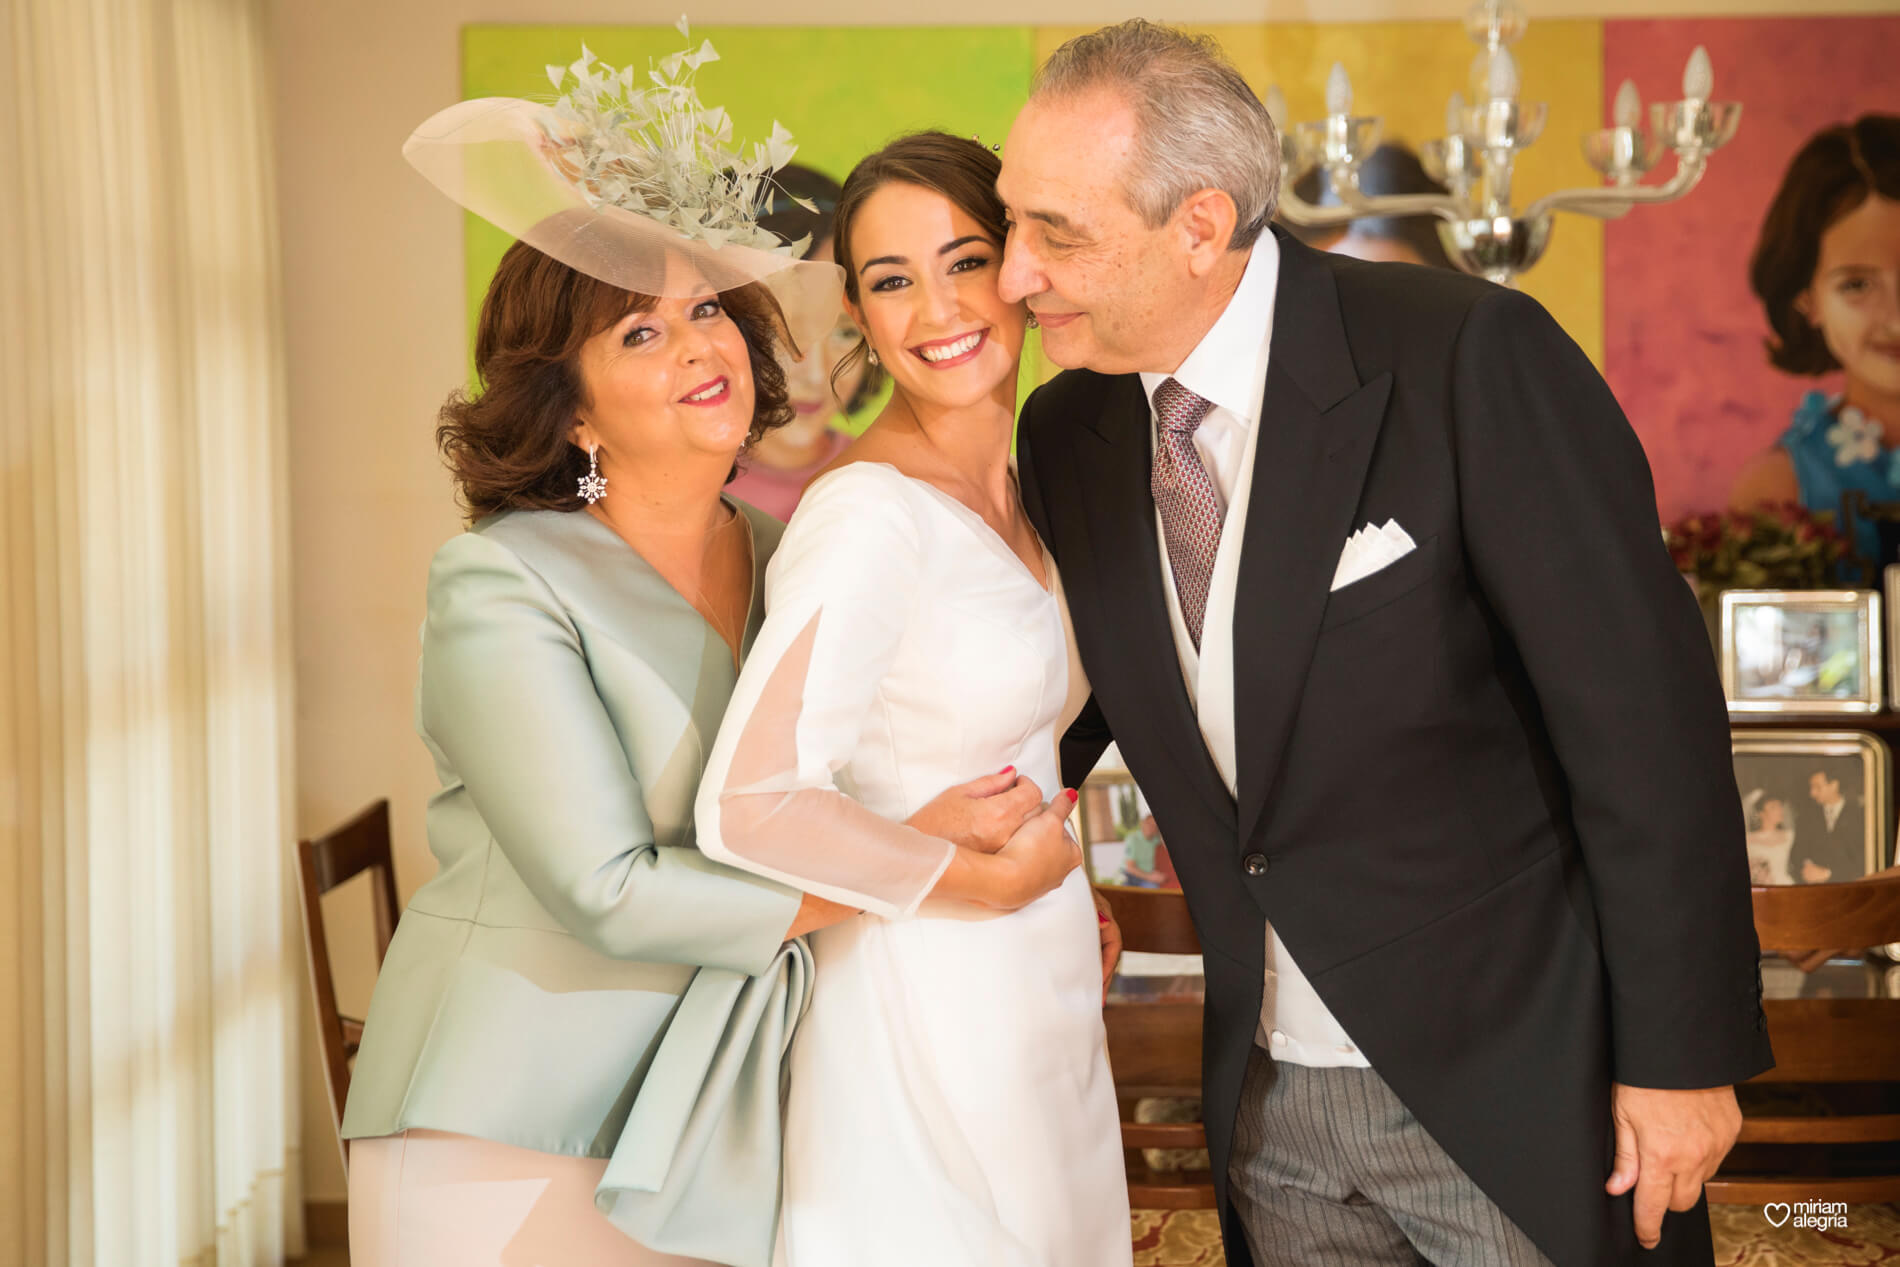 vestido-de-novia-paula-del-vas-miriam-alegria-fotografos-boda-murcia-32